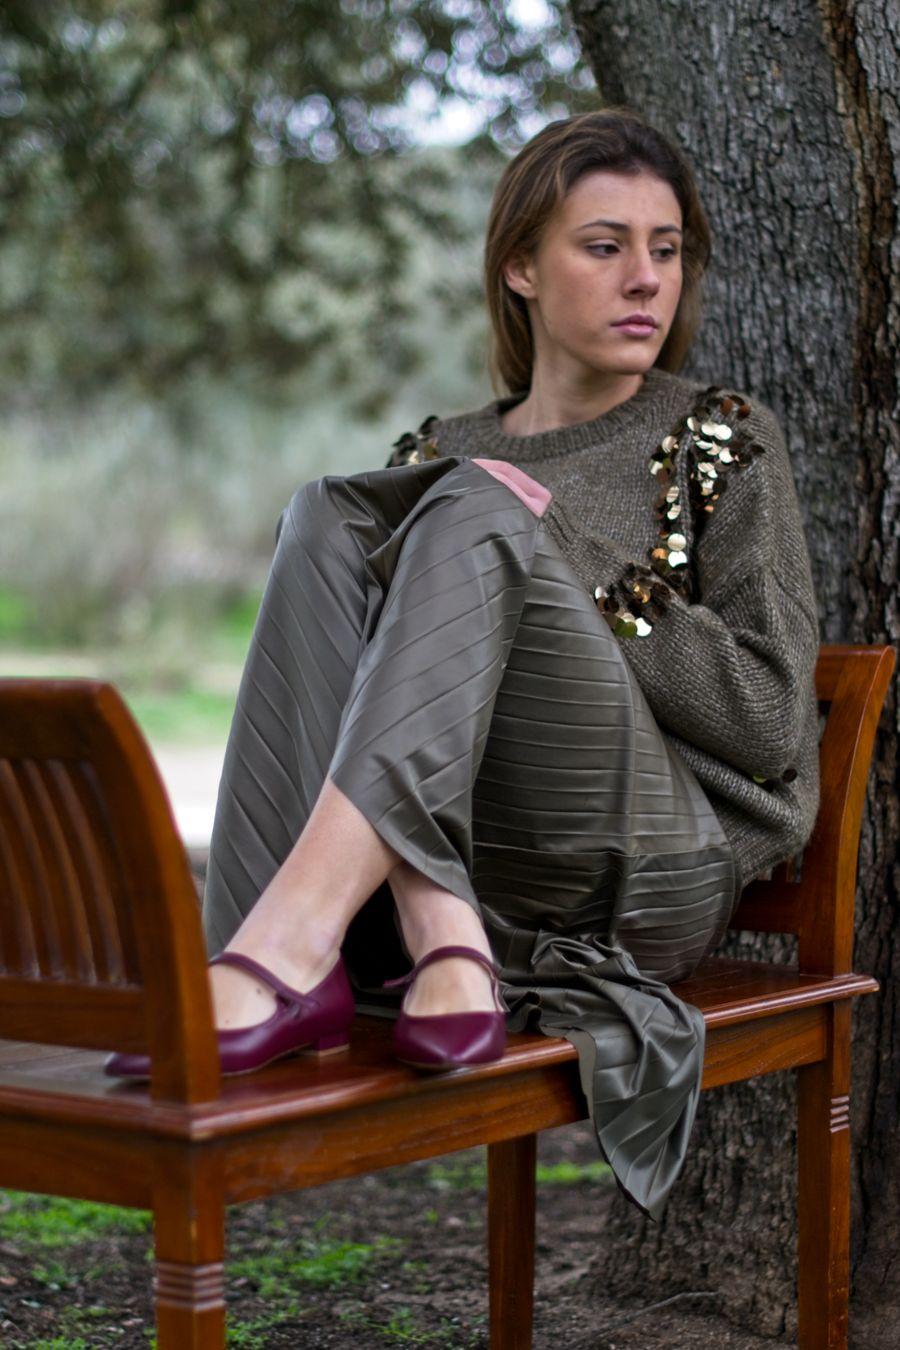 Mercedita Audrey de Bohemian Shoes en color burdeos